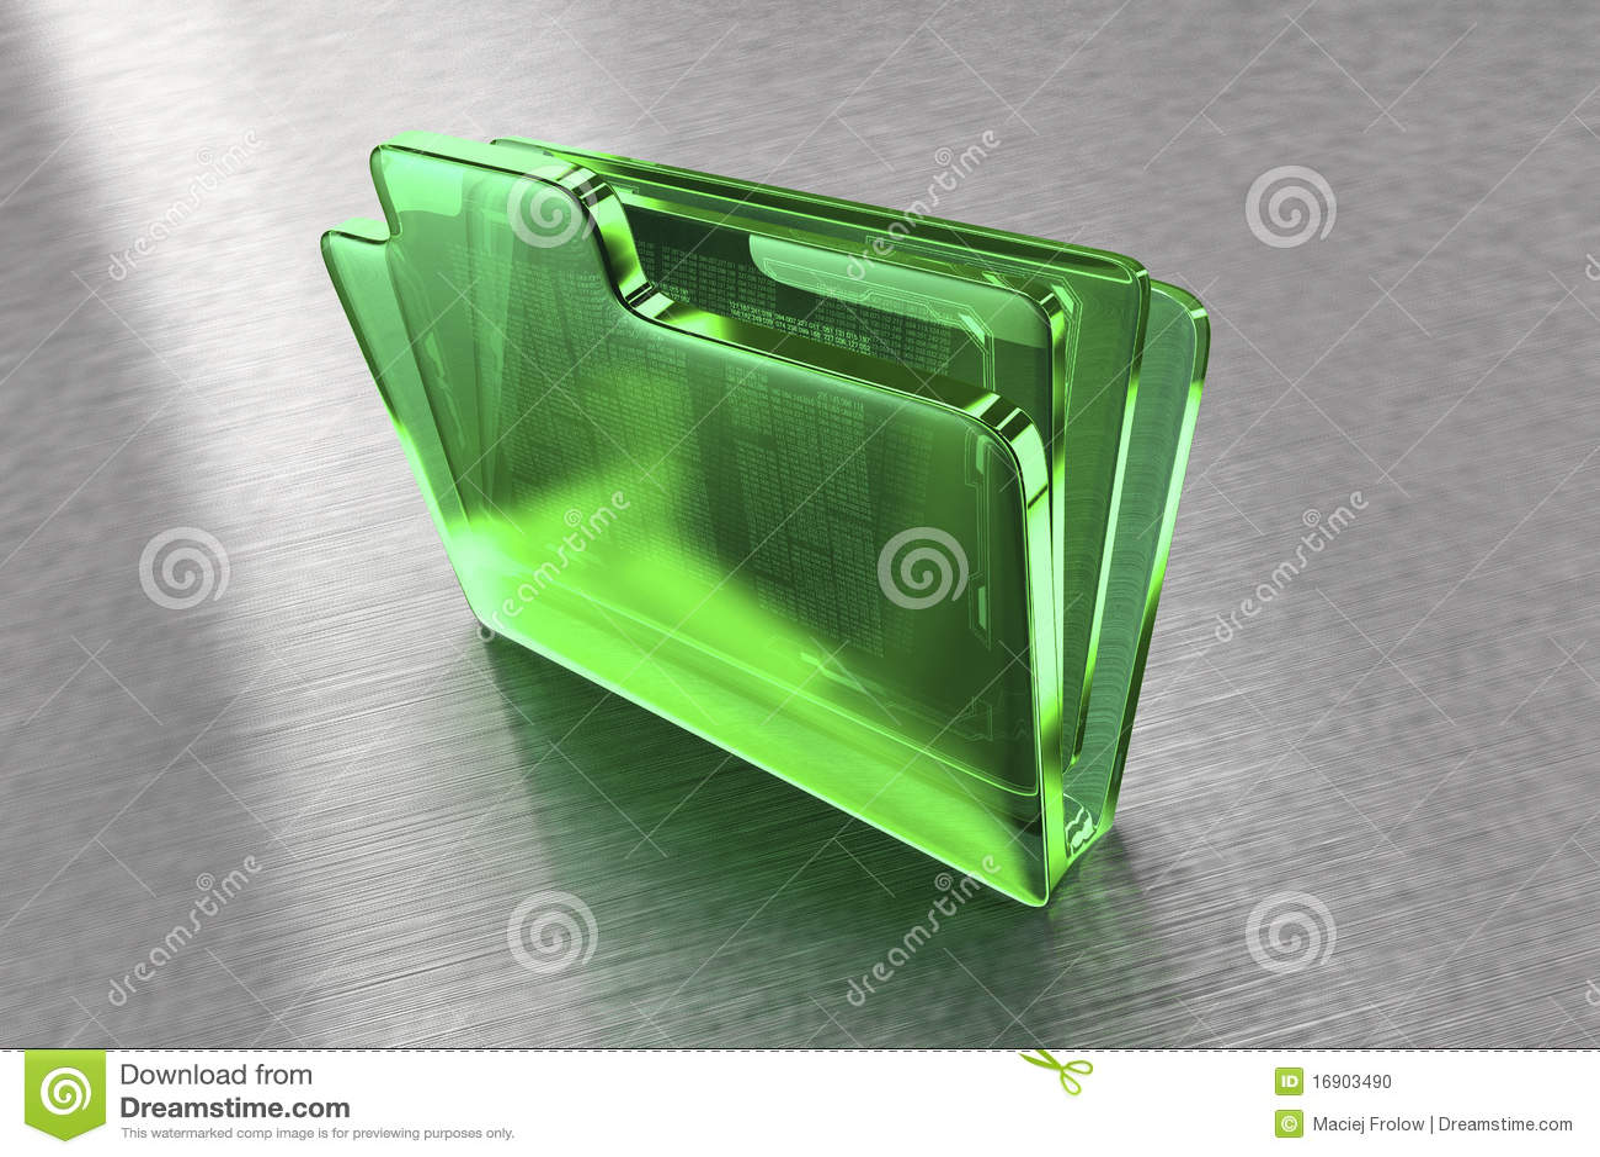 Dépliant de fichier en verre vert